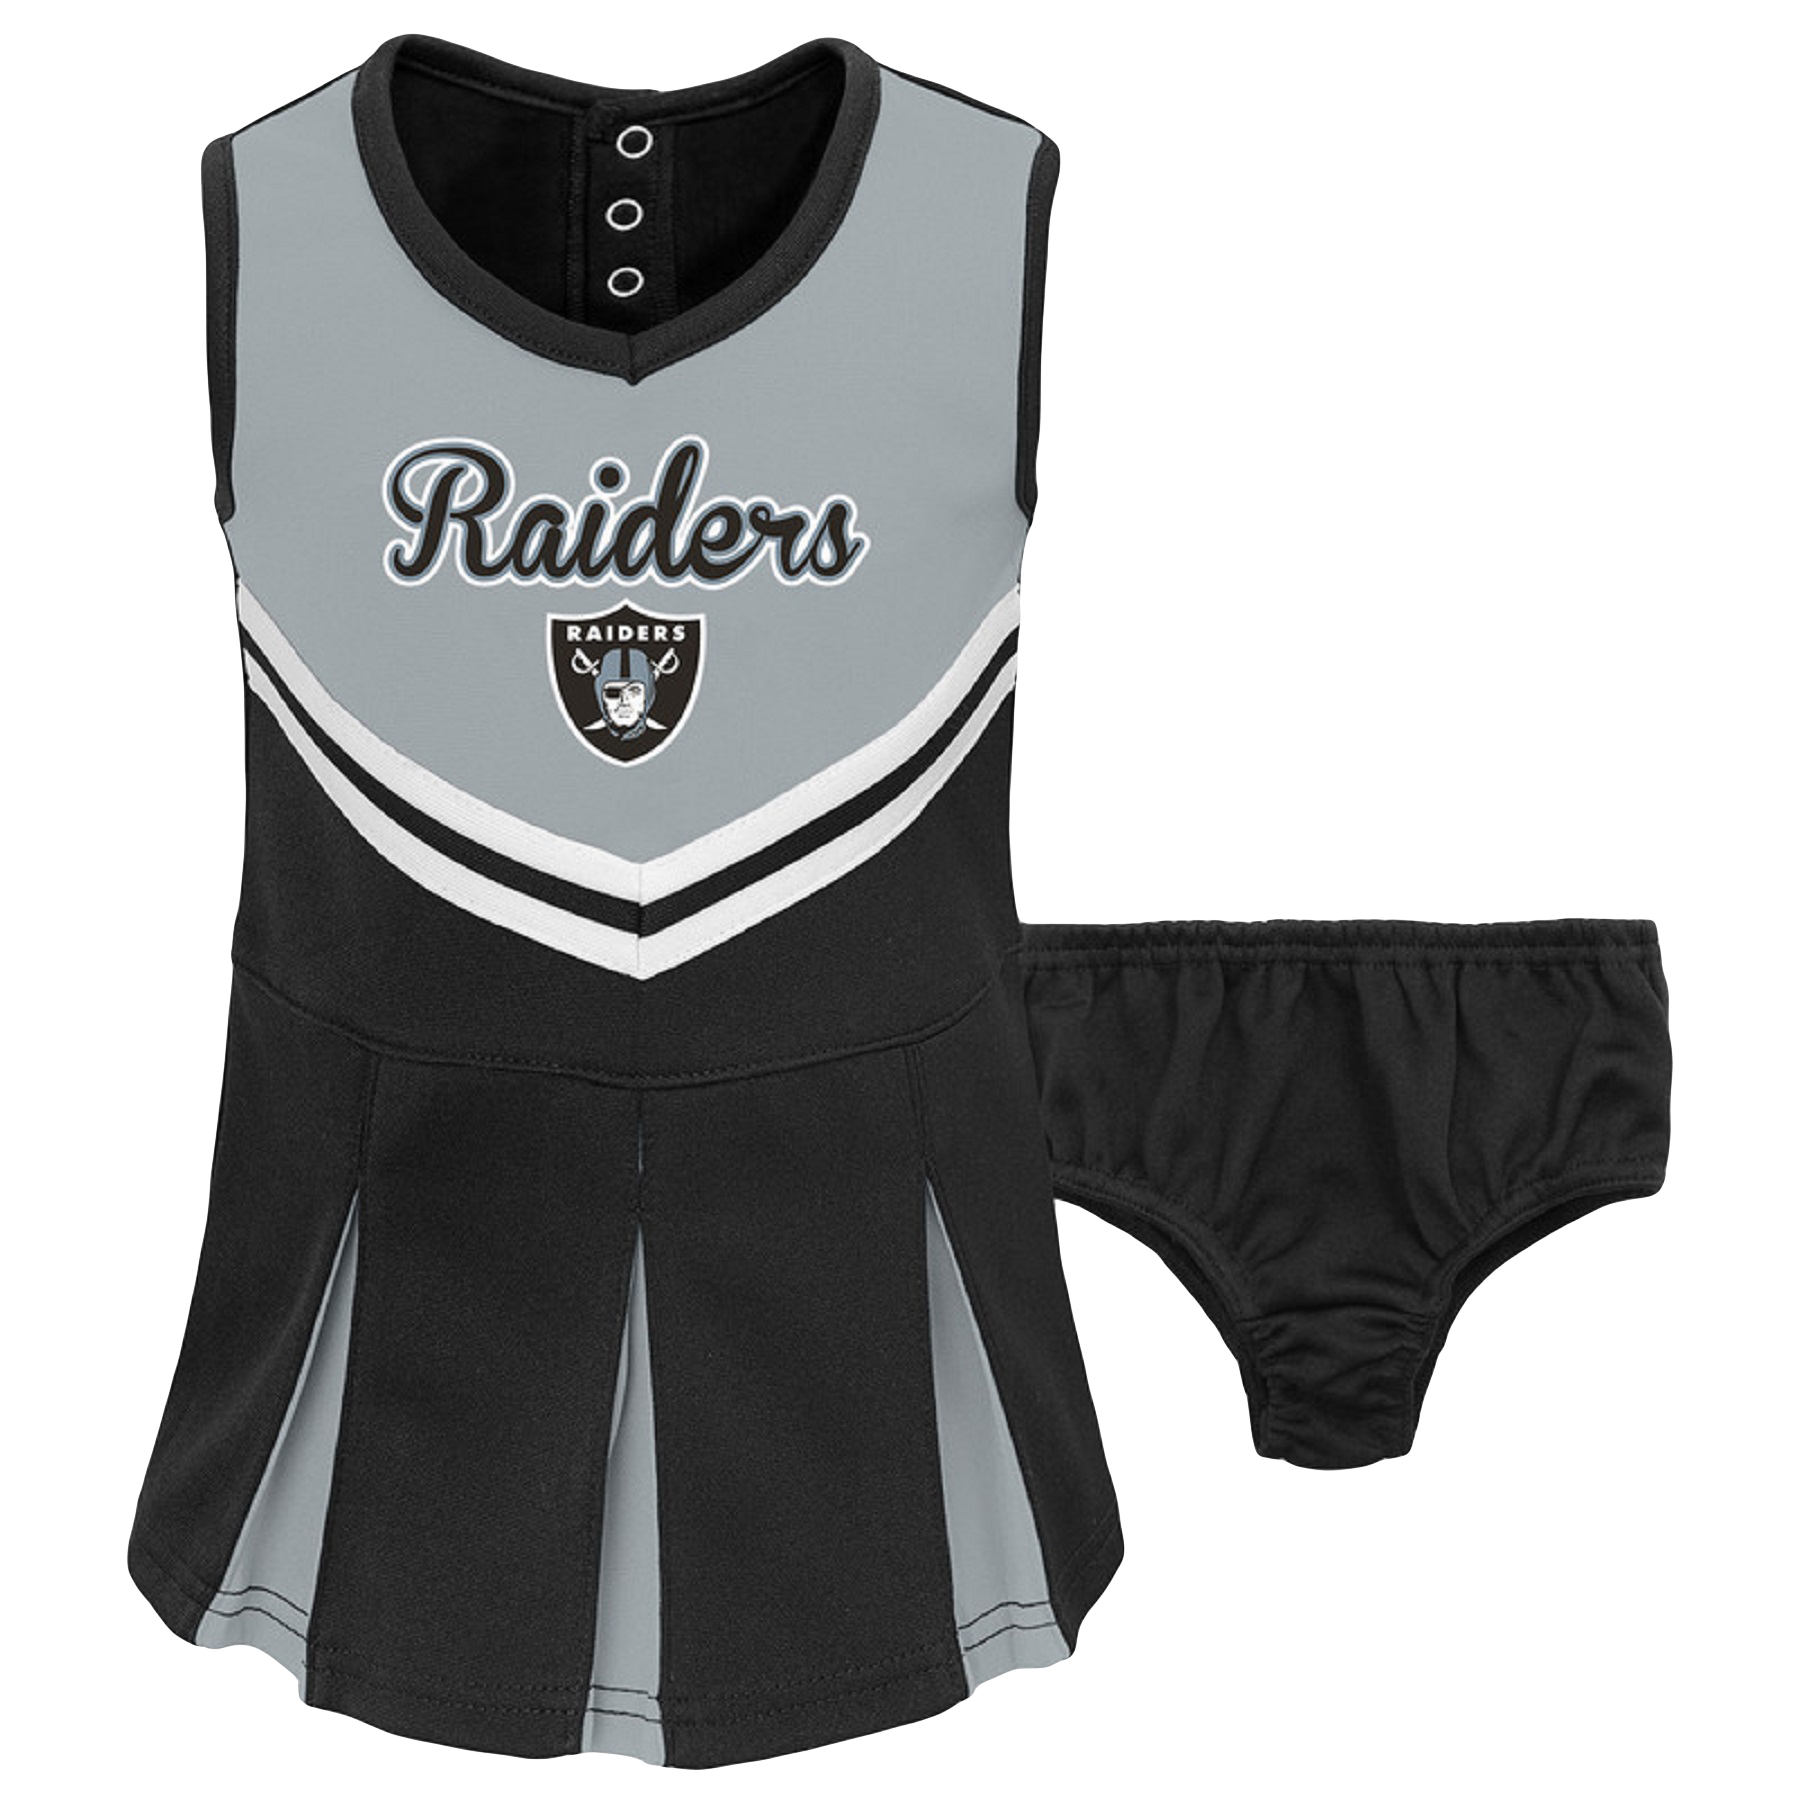 Infant Gray/Black Oakland Raiders Cheerleader Dress & Bloomers Set